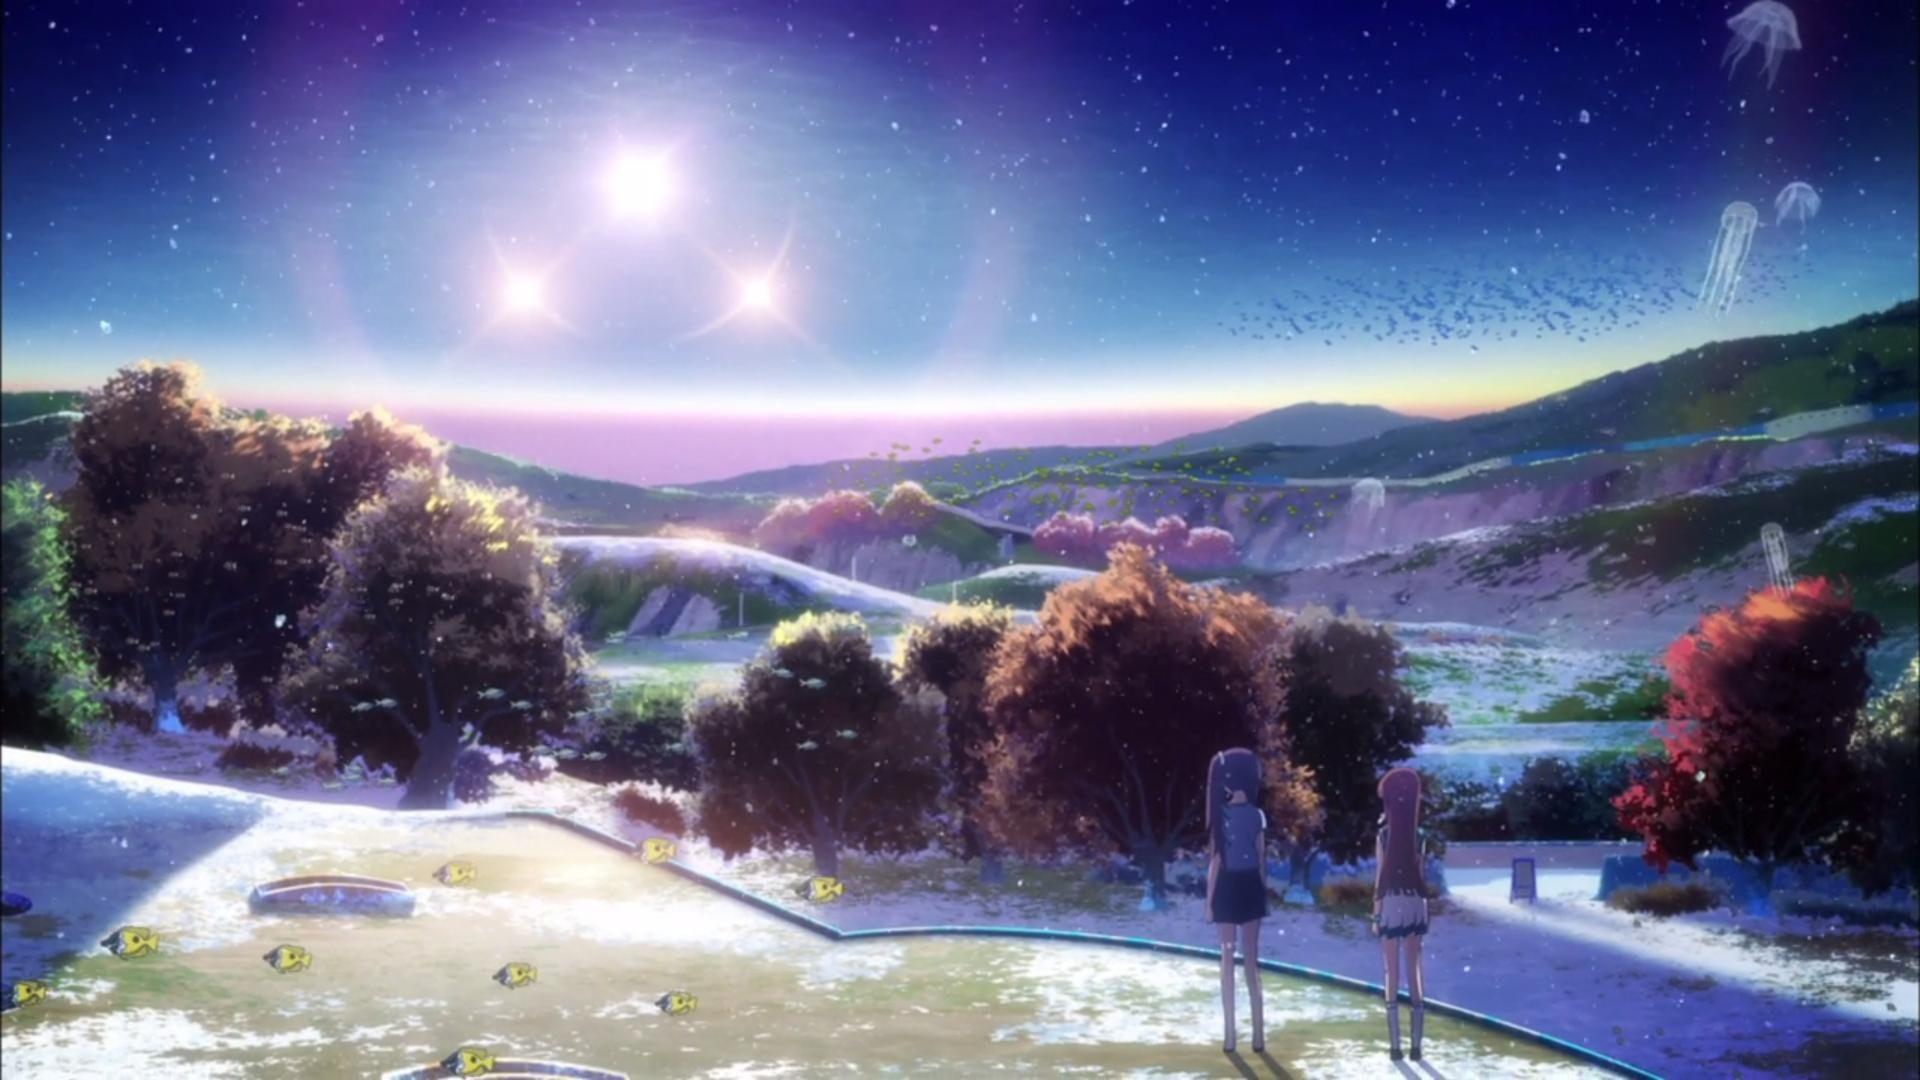 Nagi No Asukara 凪のあすから 凪のあすから 凪のあすから